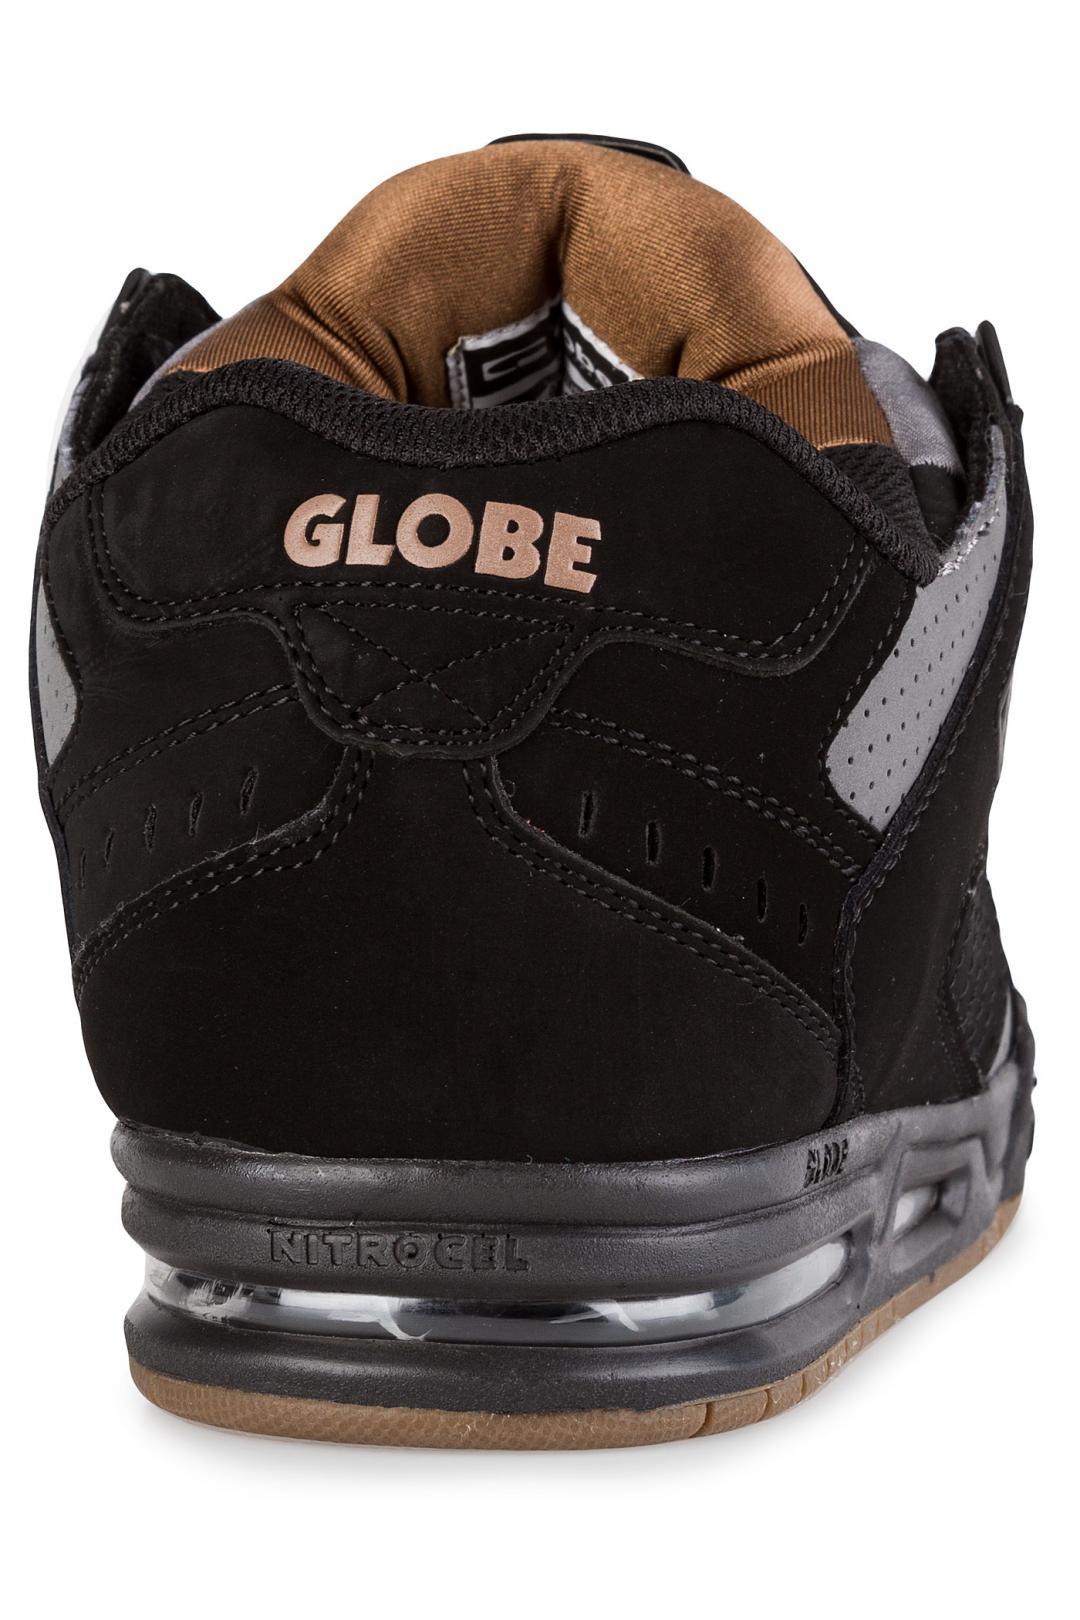 Uomo Globe Sabre black charcoal woodsmoke brown | Scarpe da skate